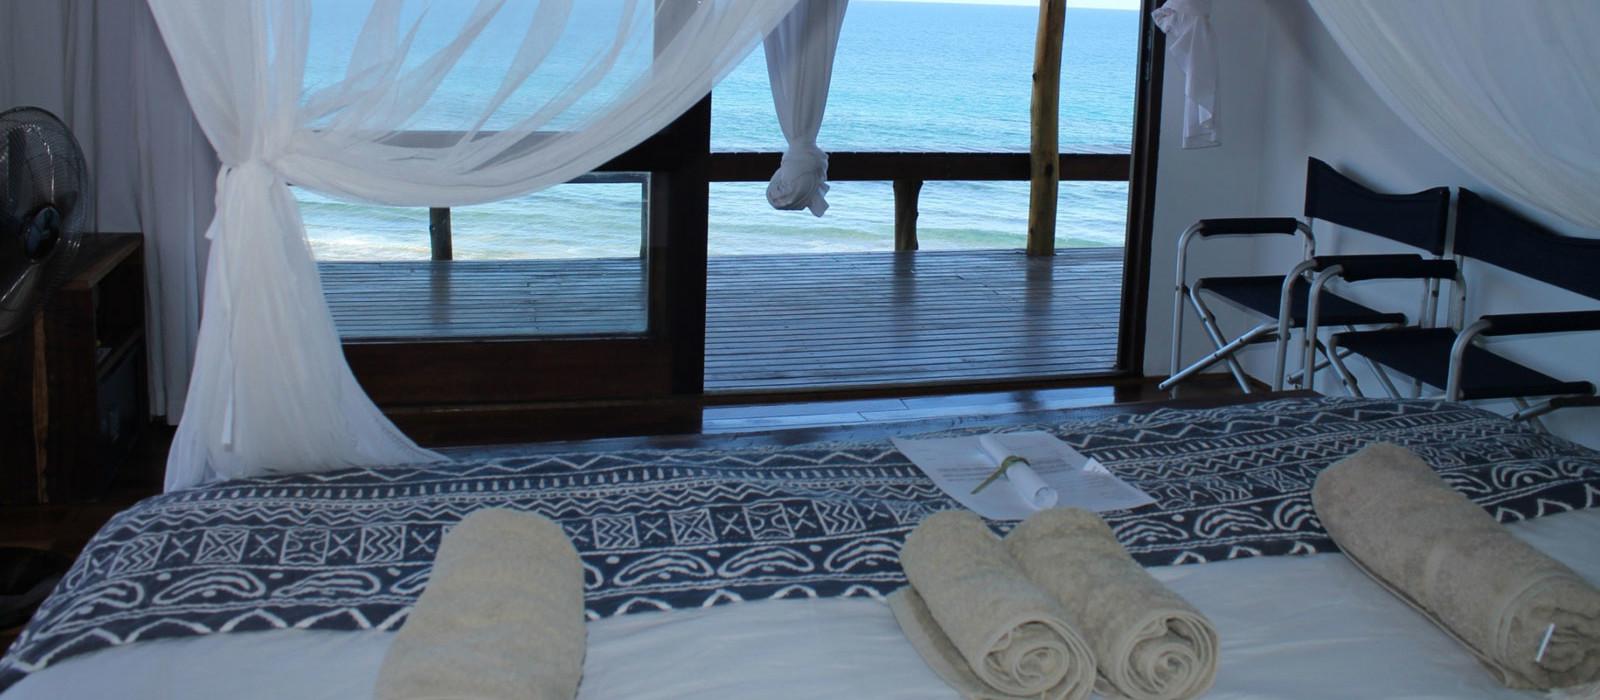 Hotel Blue Footprint Eco Lodge